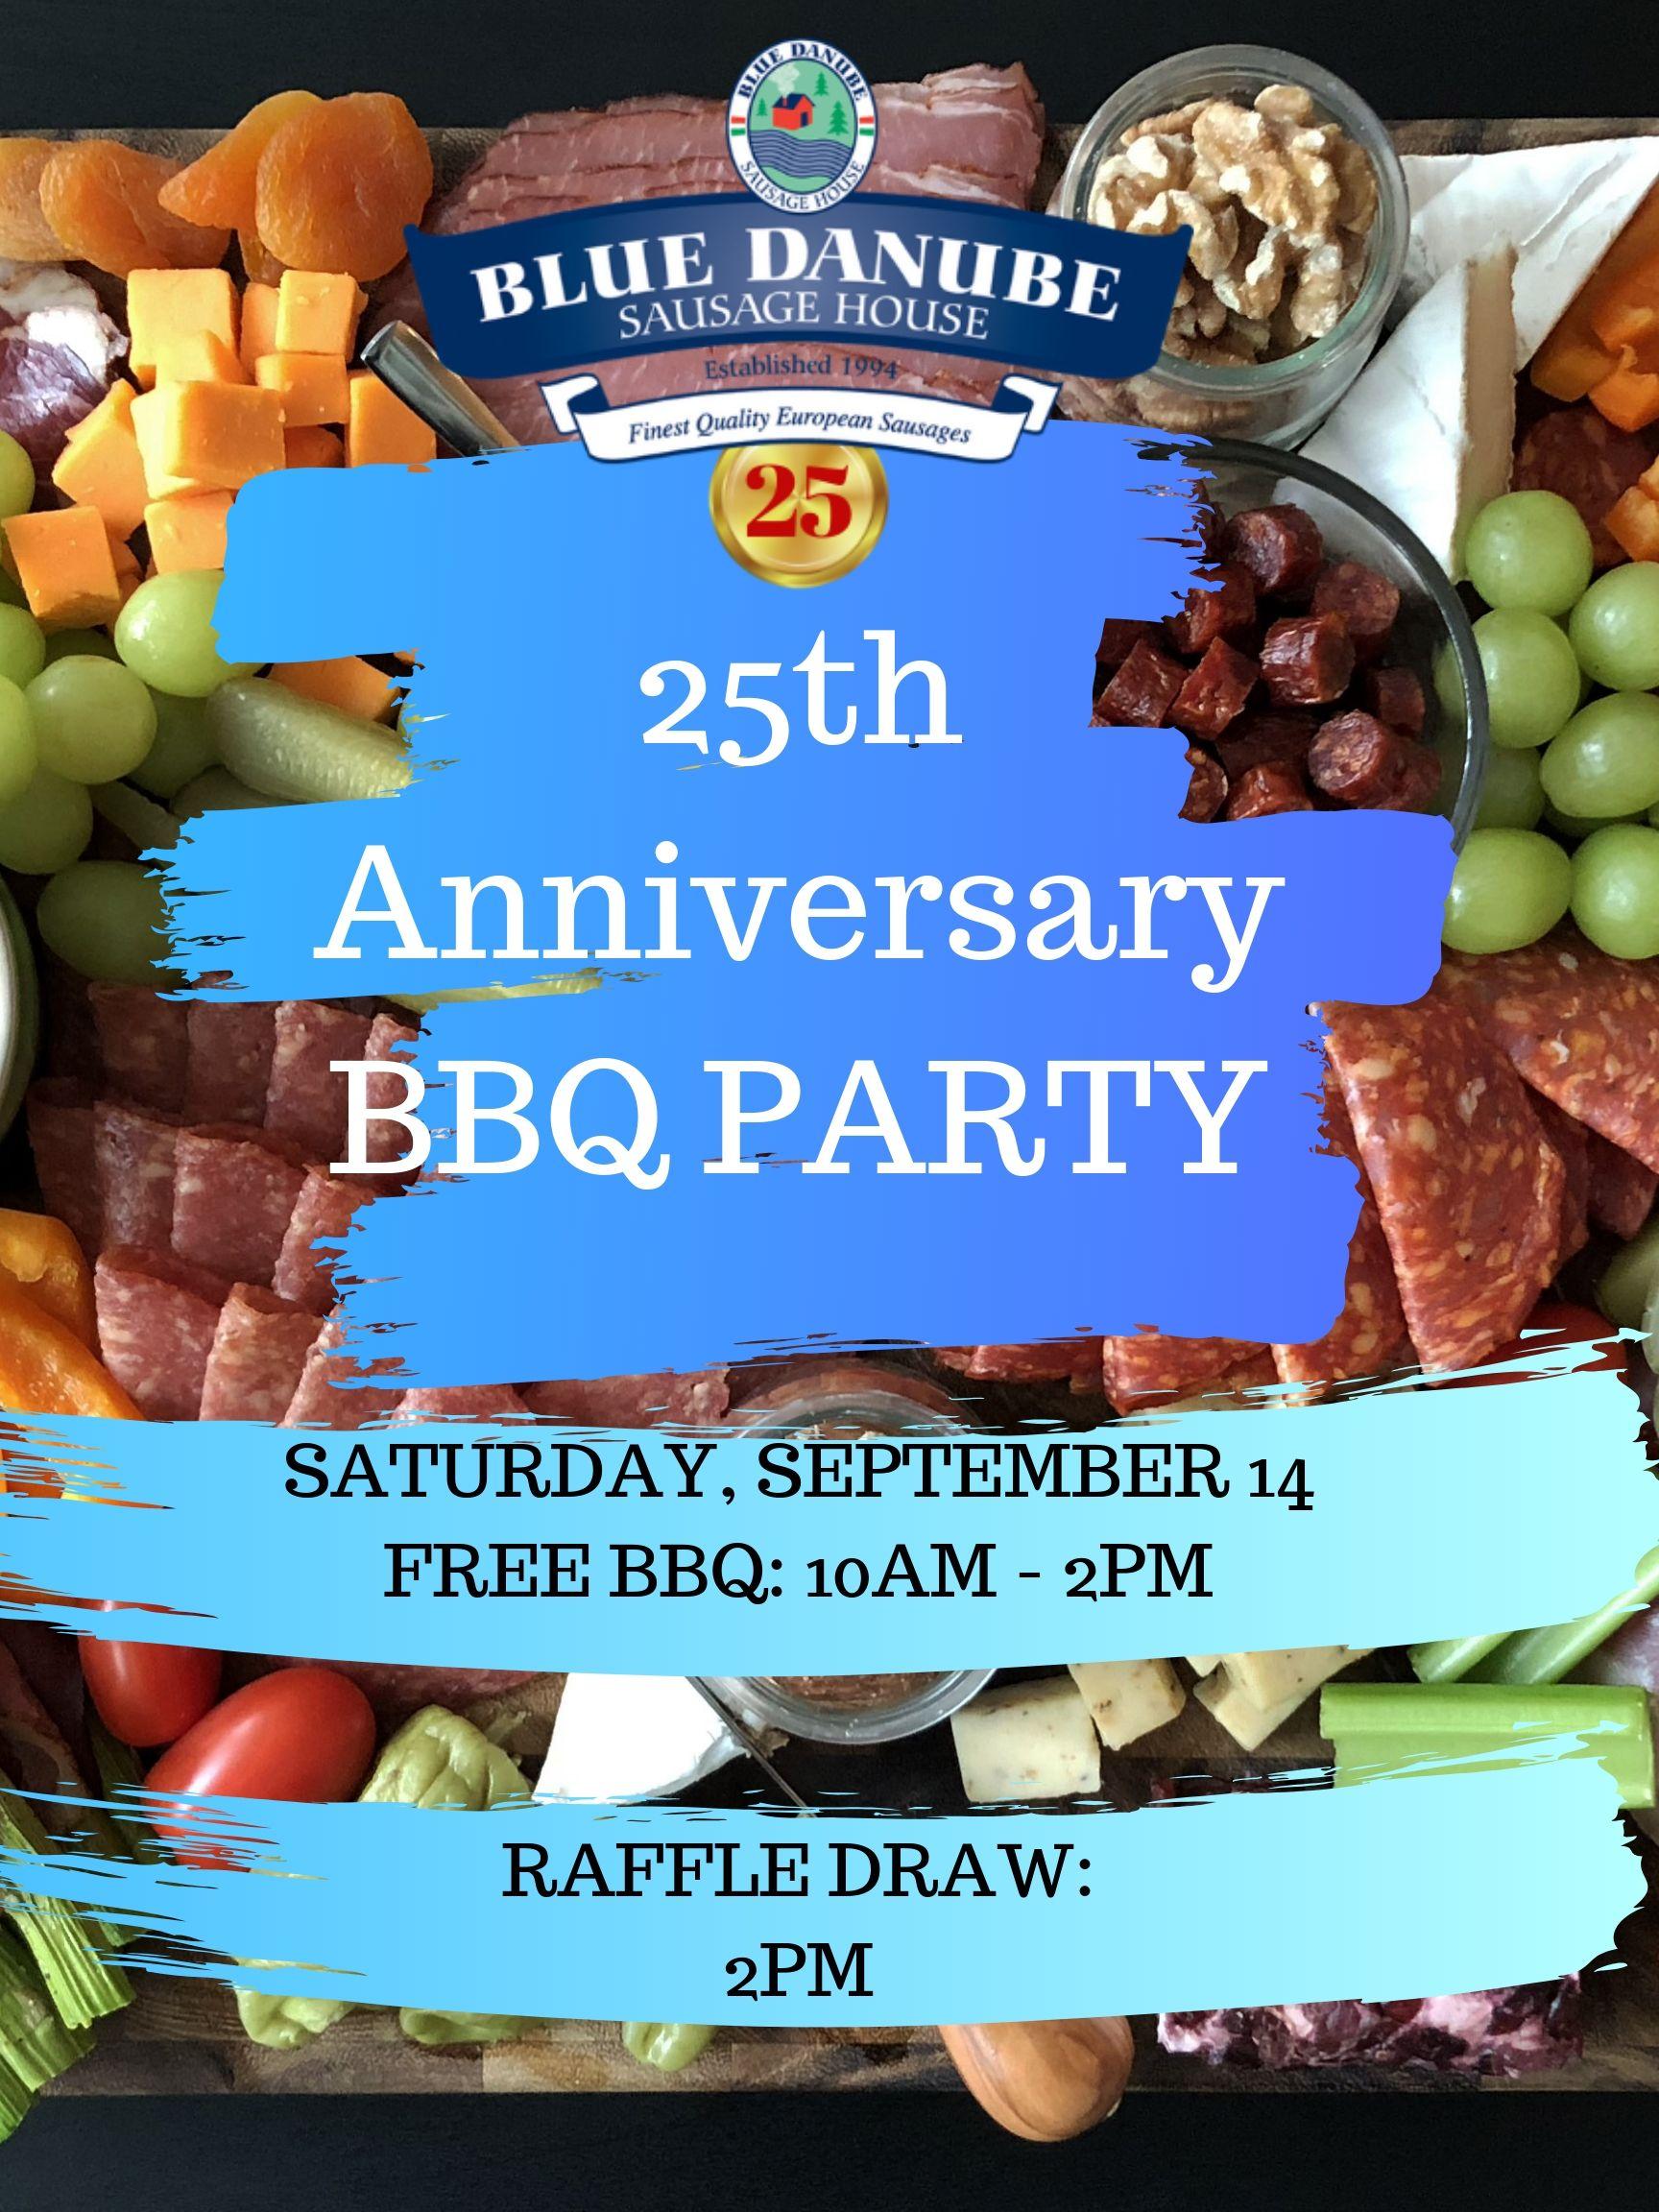 25th Anniversary BBQ PARTY.jpg